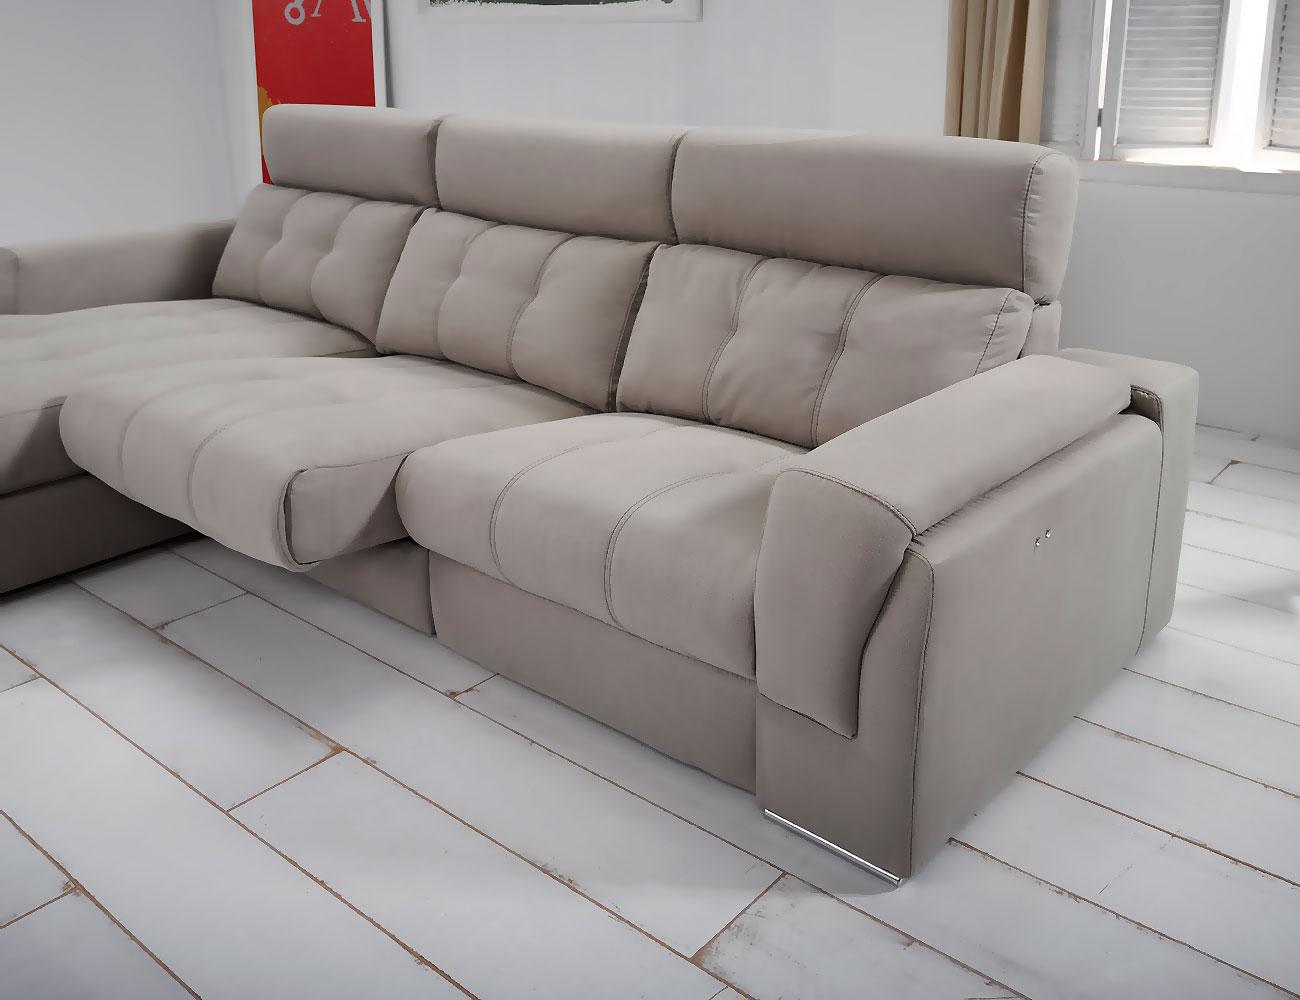 Sofa chaiselongue piel con arcon relax electrico 3